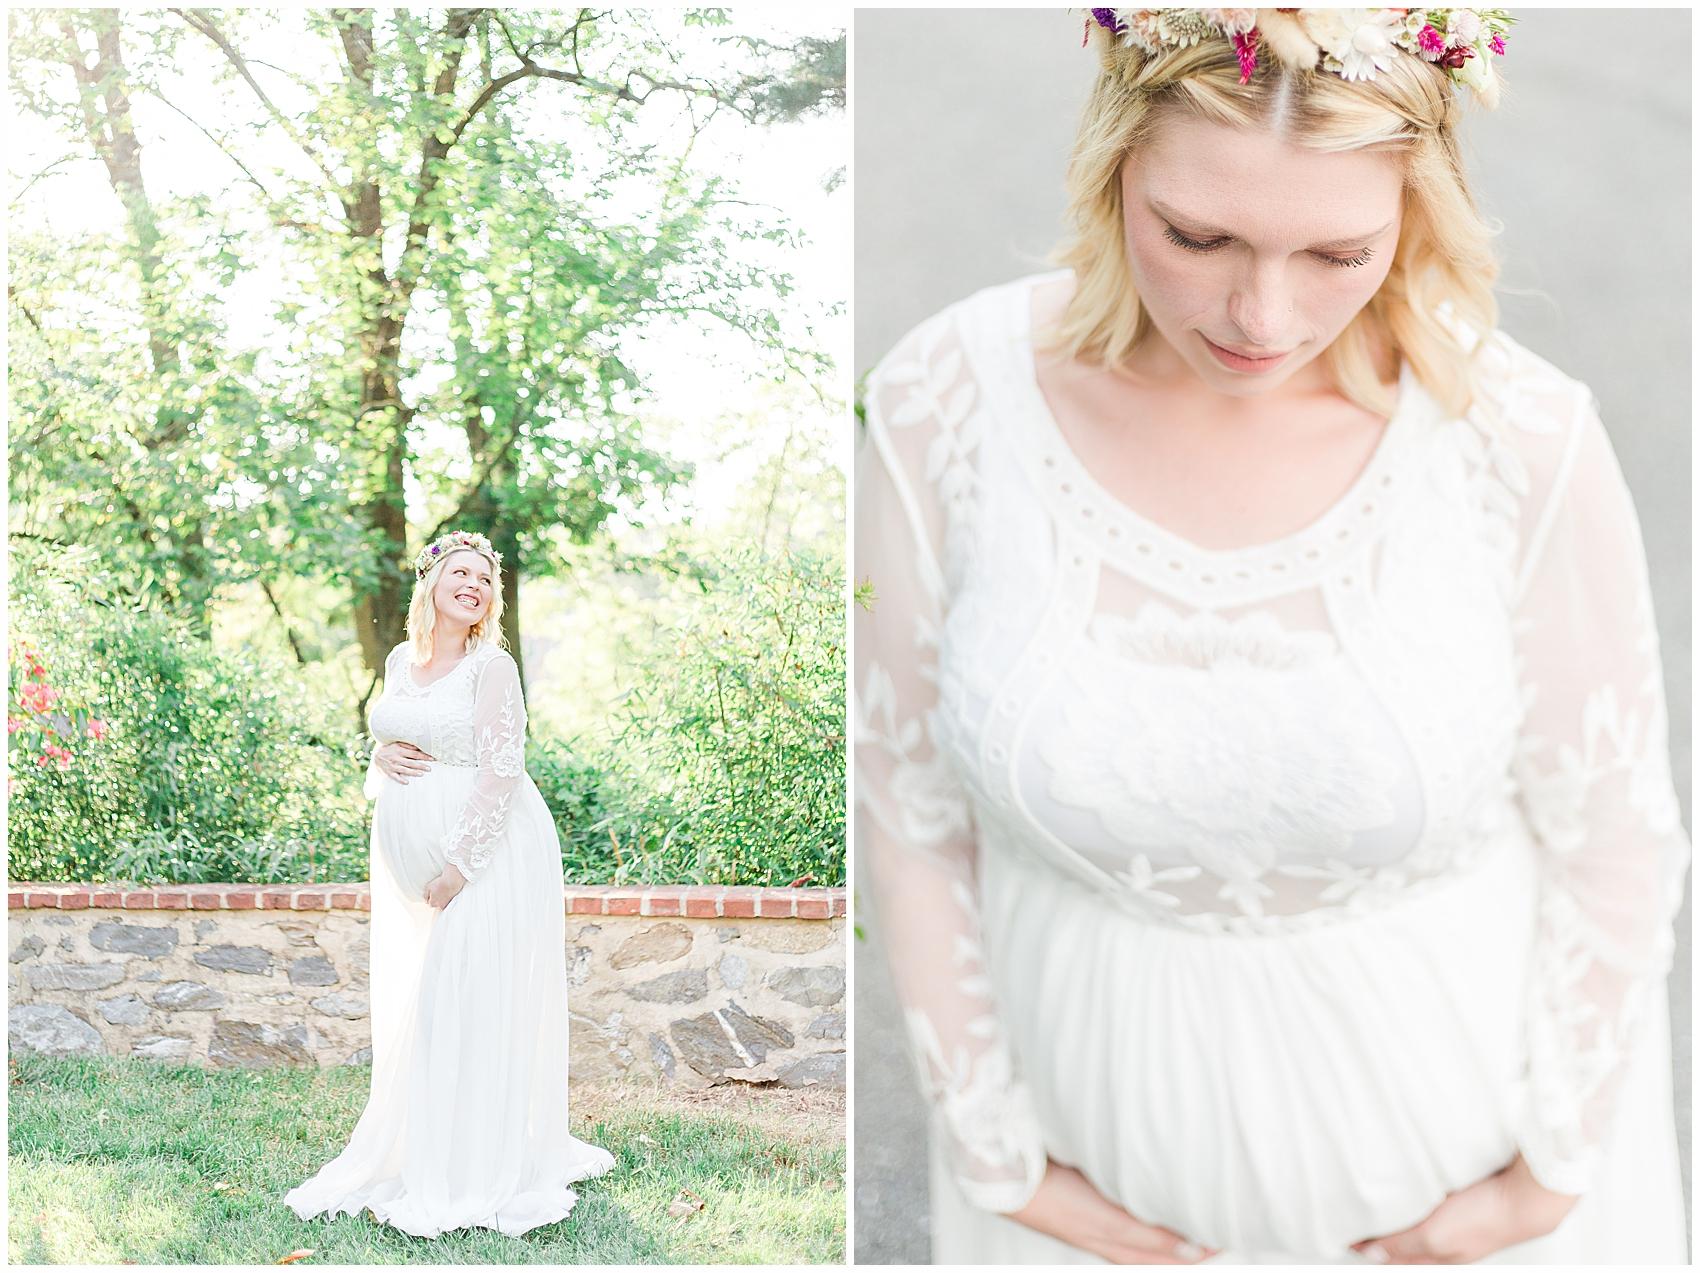 lancaster-pa-maternity-photographer-17.jpg